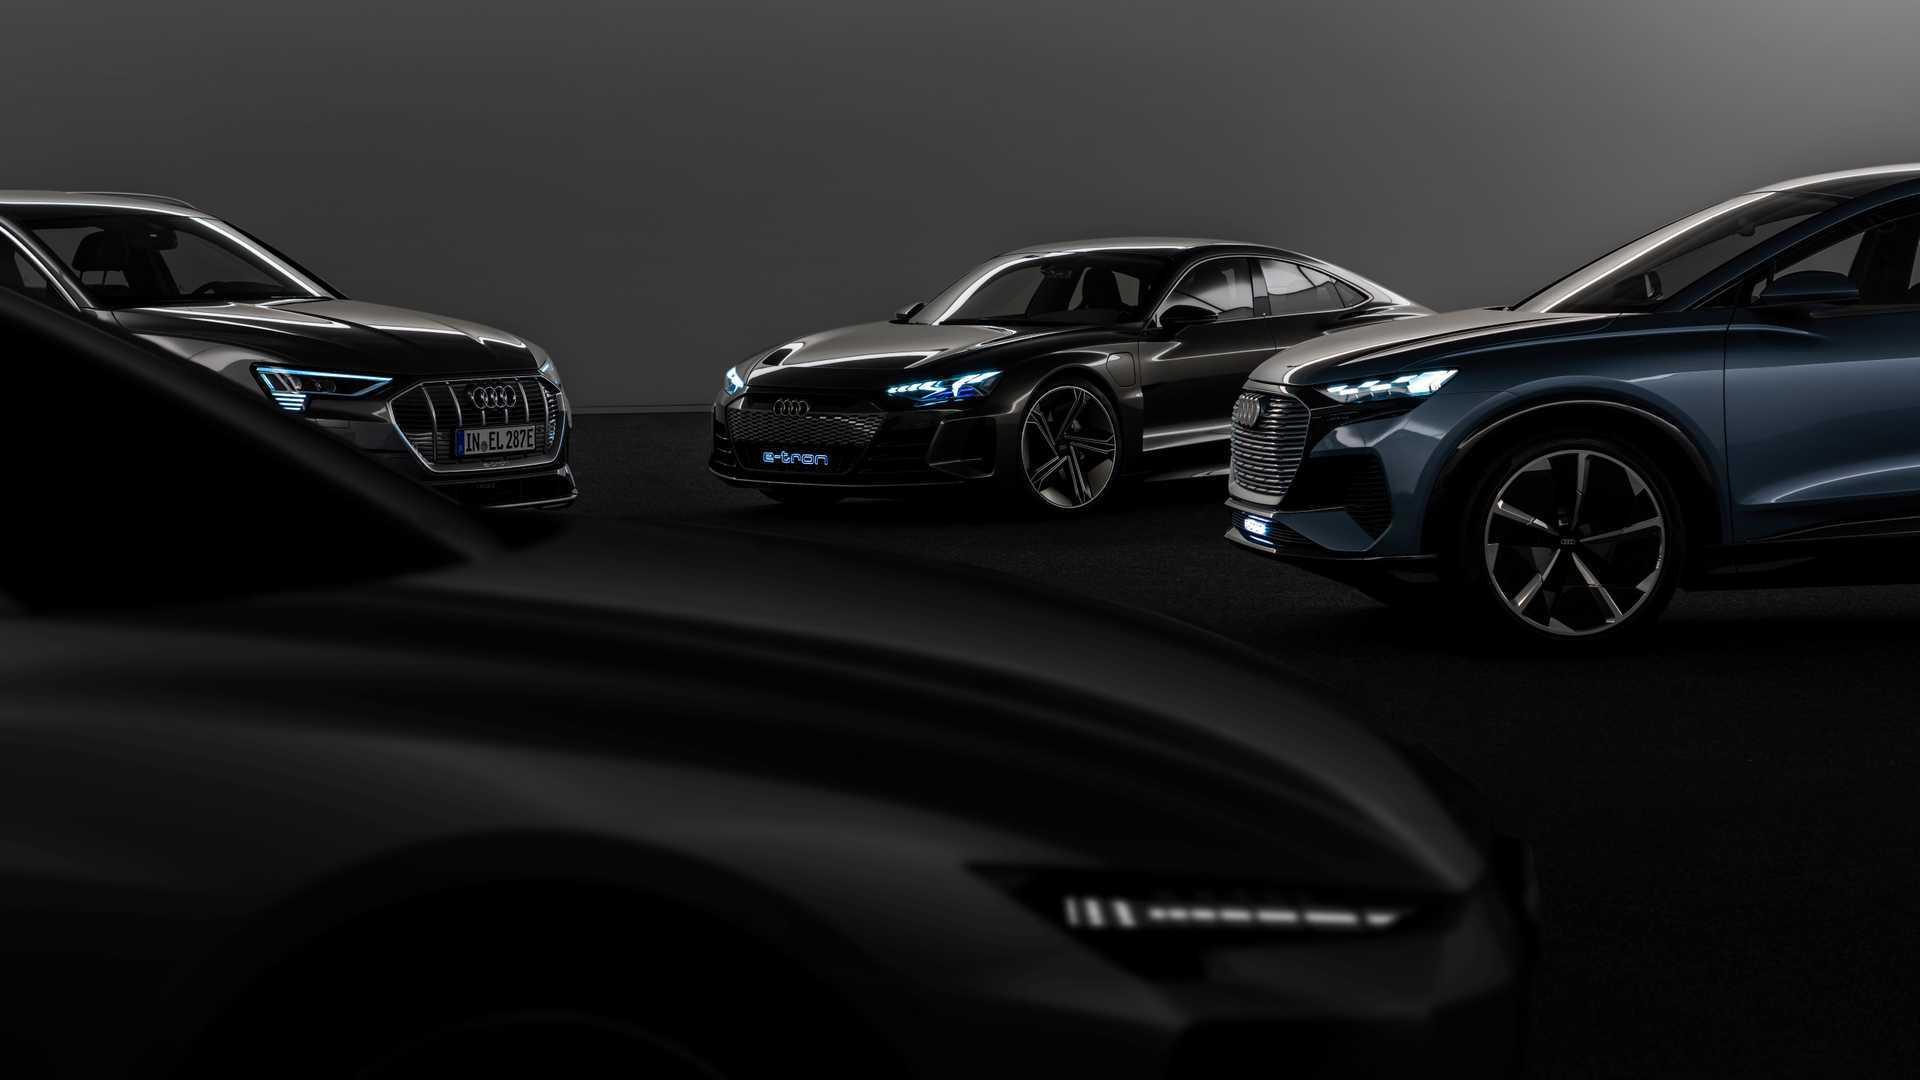 202x - [Audi] A9 E-Tron Sportback  Audi-new-electric-sportback-concept-teaser